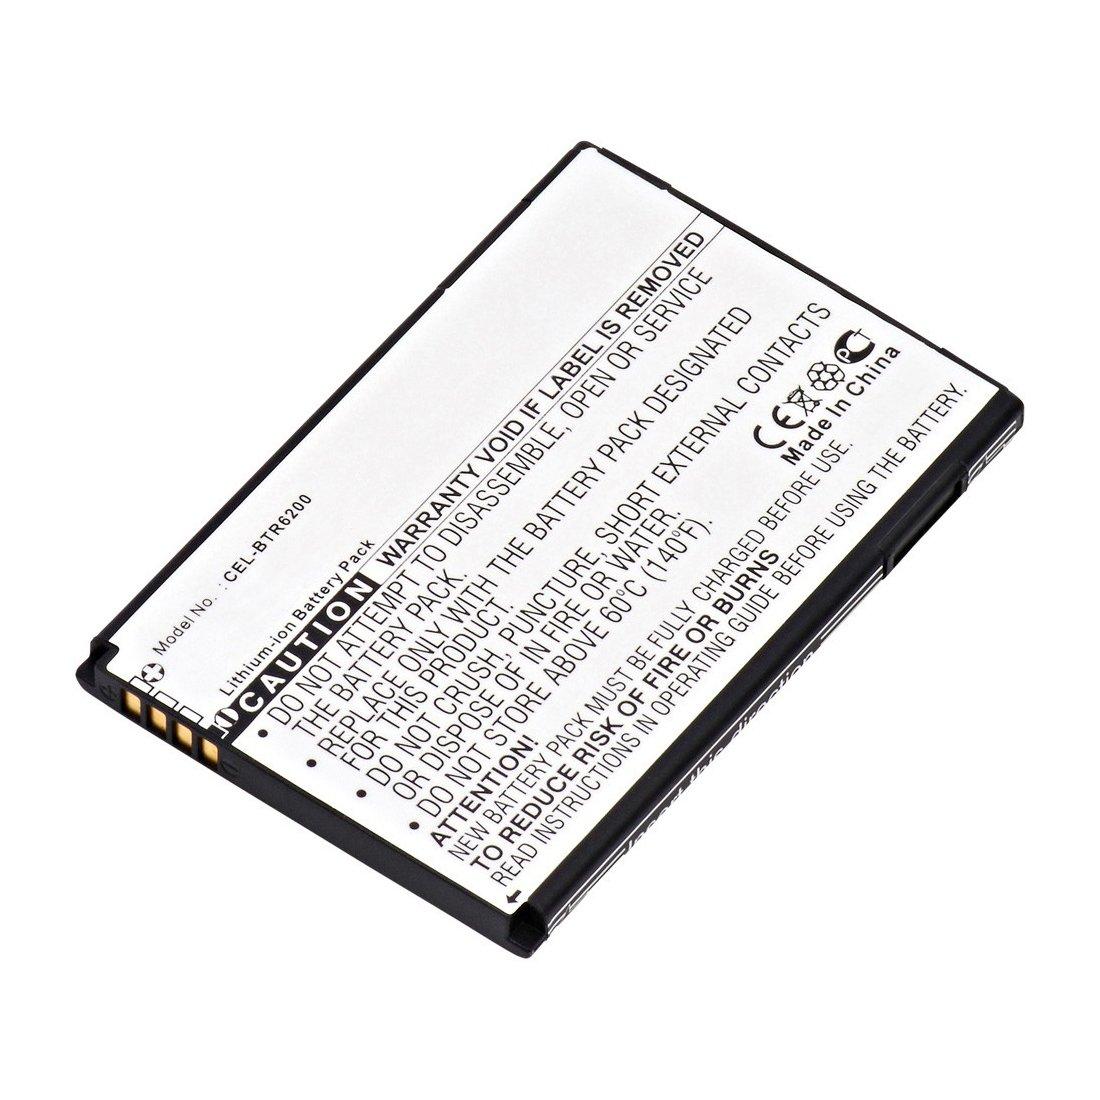 Replacement HTC Droid Eris Battery: BatteryMart.com